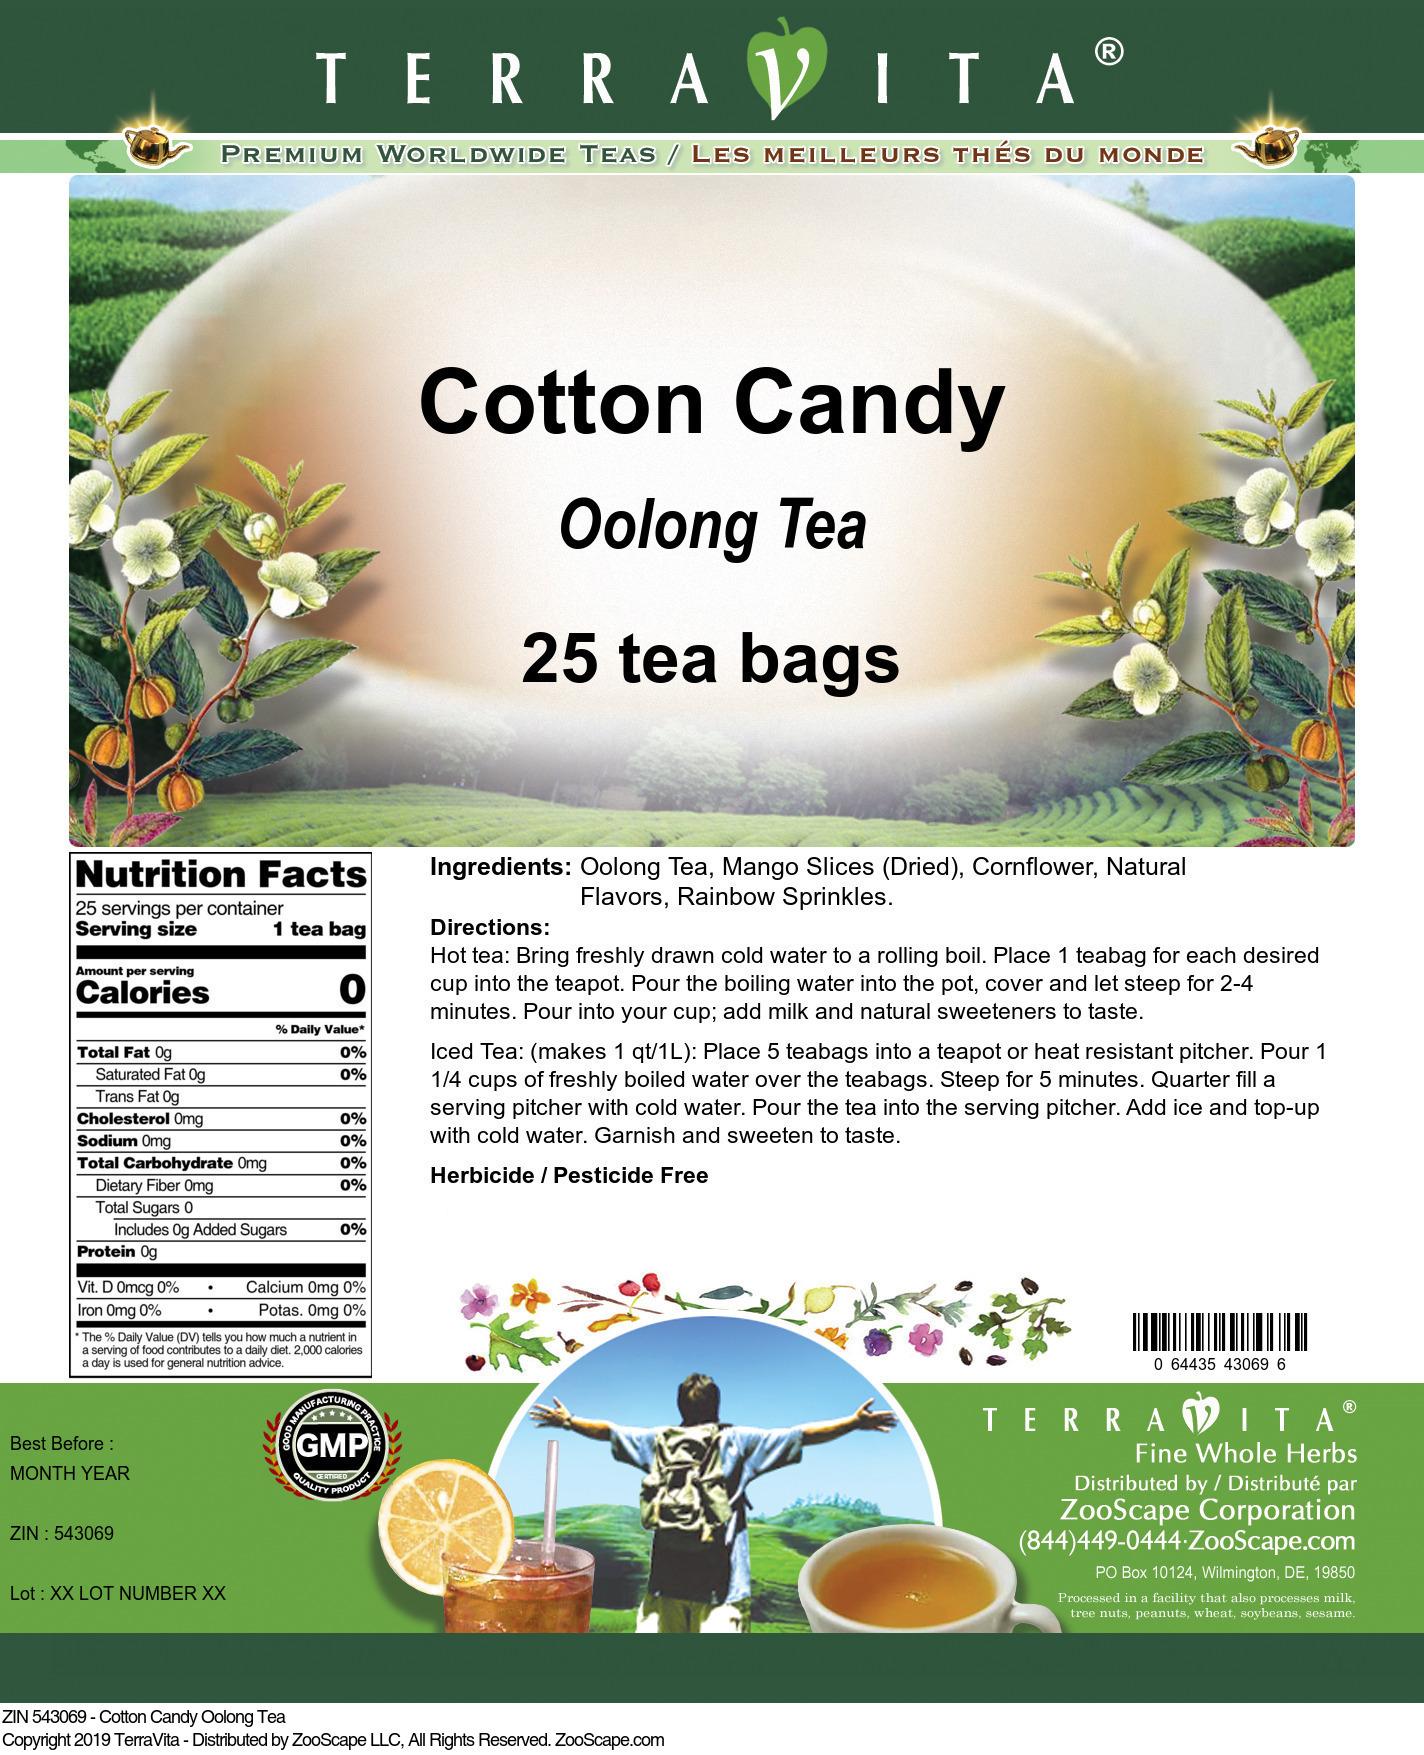 Cotton Candy Oolong Tea